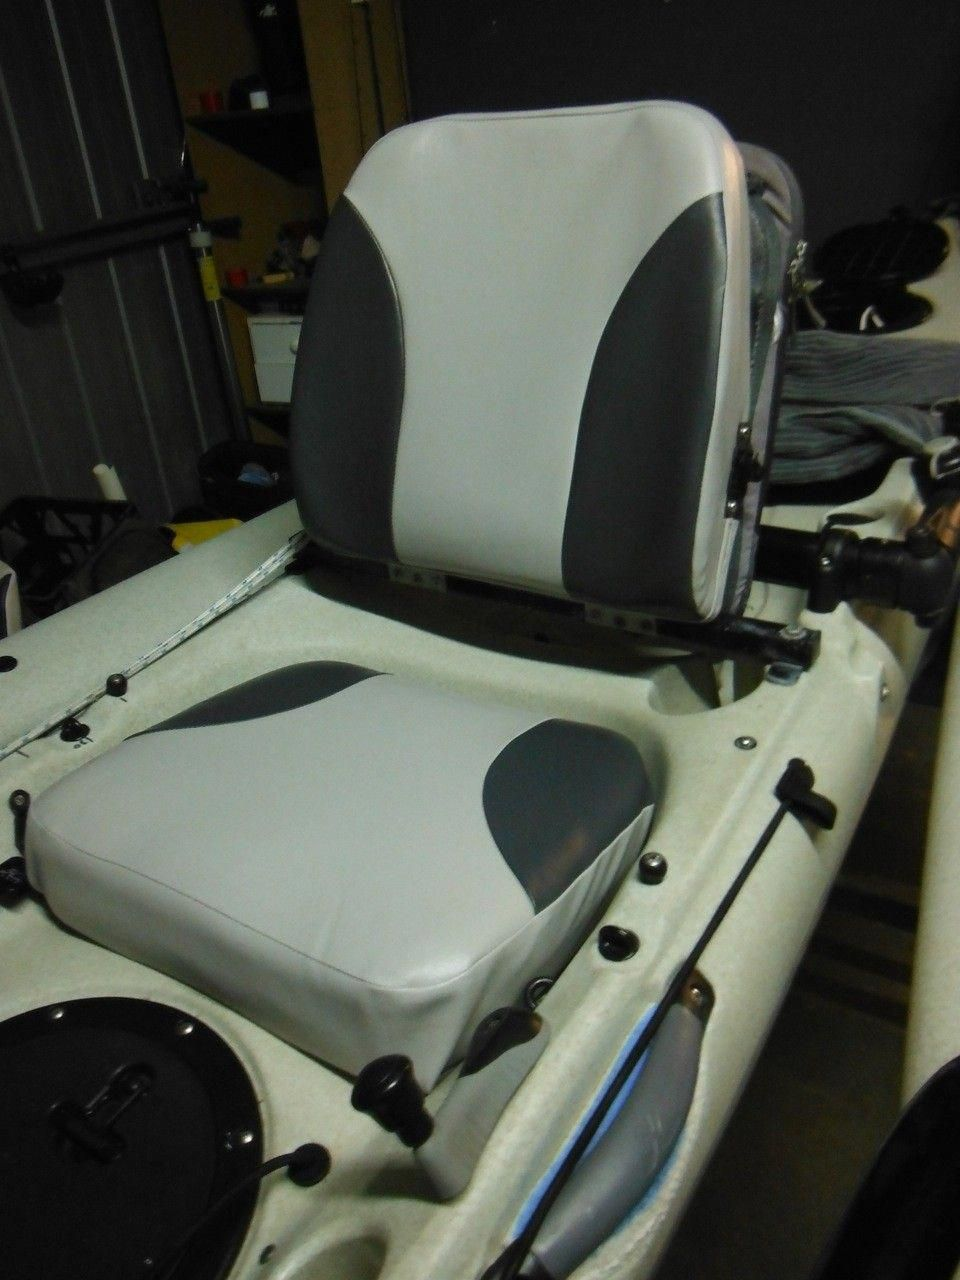 20 Comfy Kayak Boat Seat Modification Ideas Go Travels Plan Kayak Boats Kayak Seats Kayak Fishing Tips